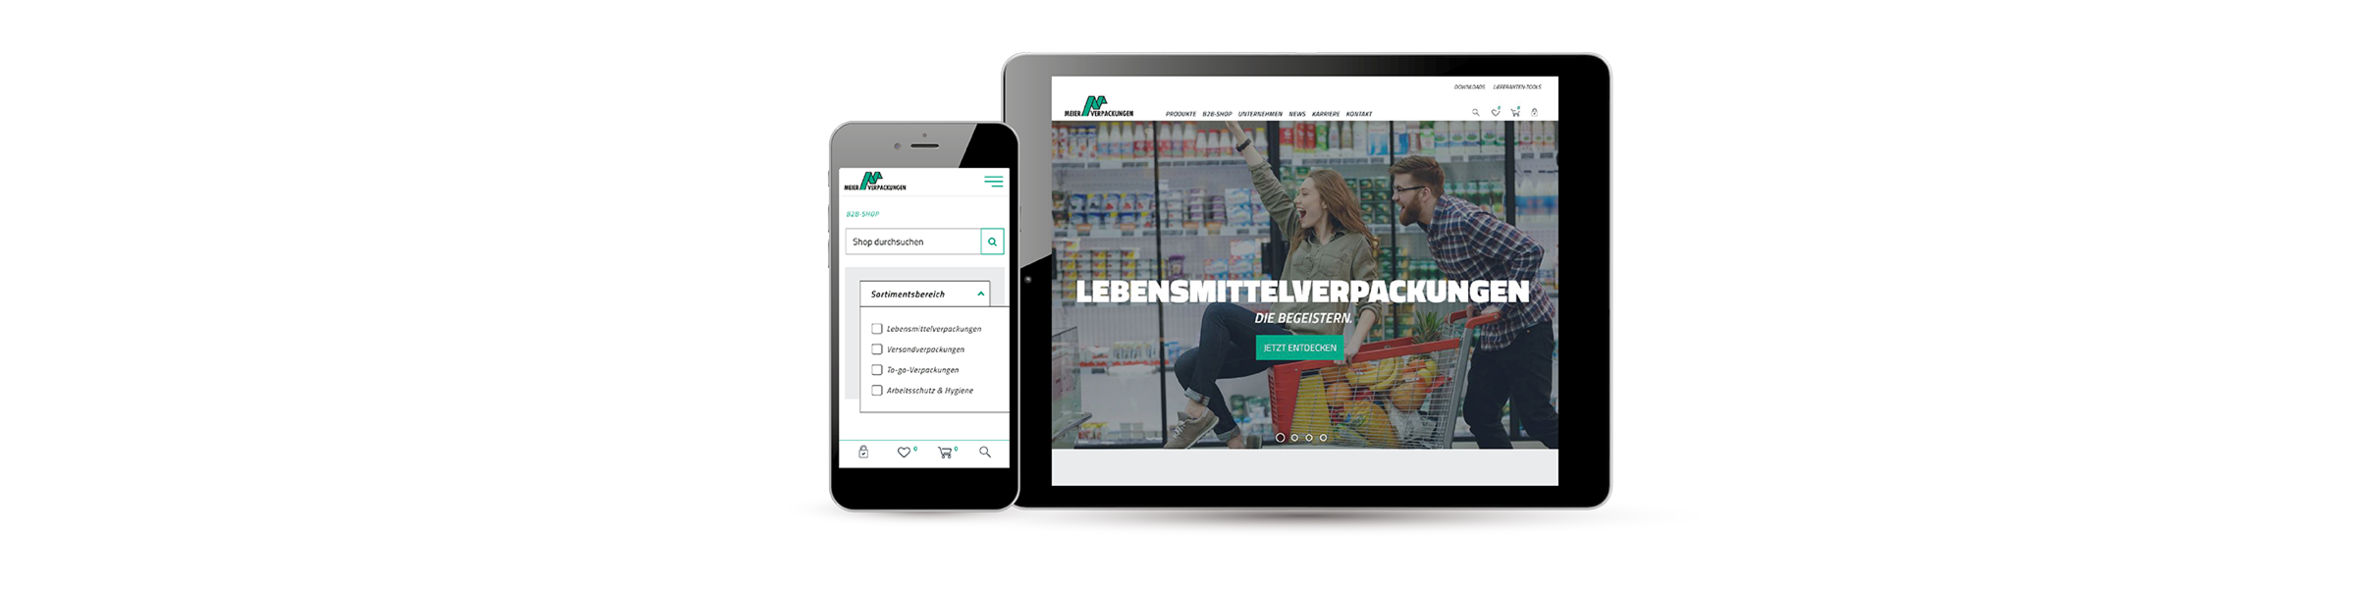 Meier Verpackungen, APP, IOS, Android